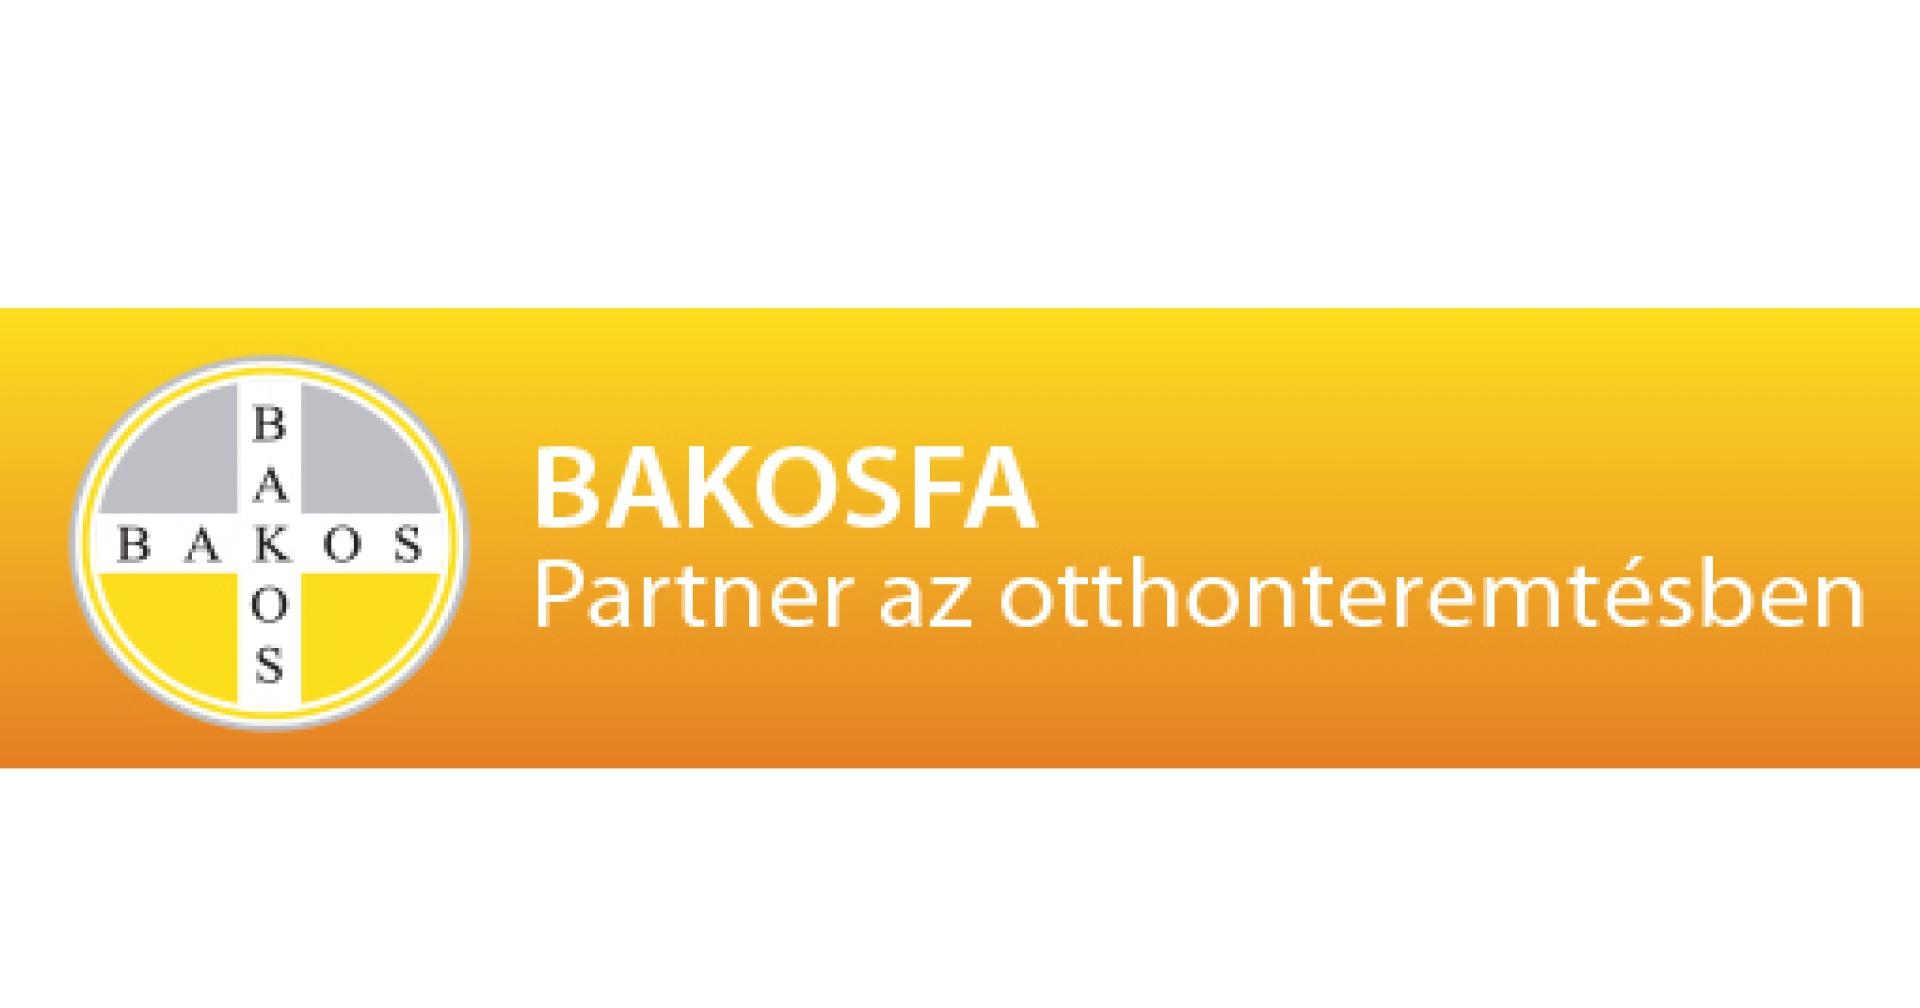 Bakosfa